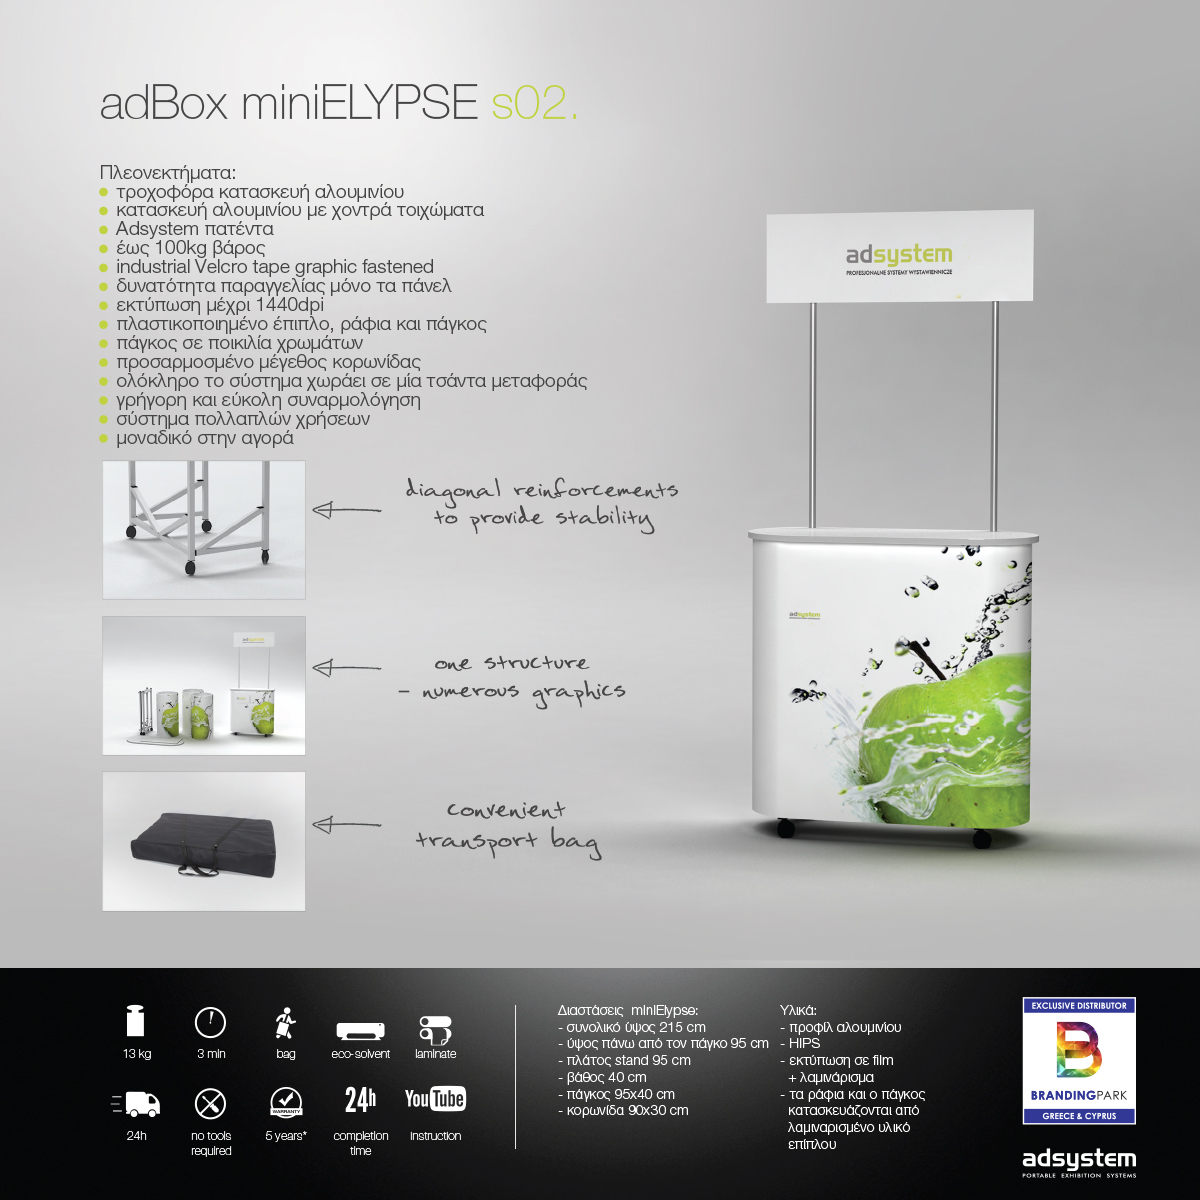 Promo stand adBox mini ELYPSE s02.